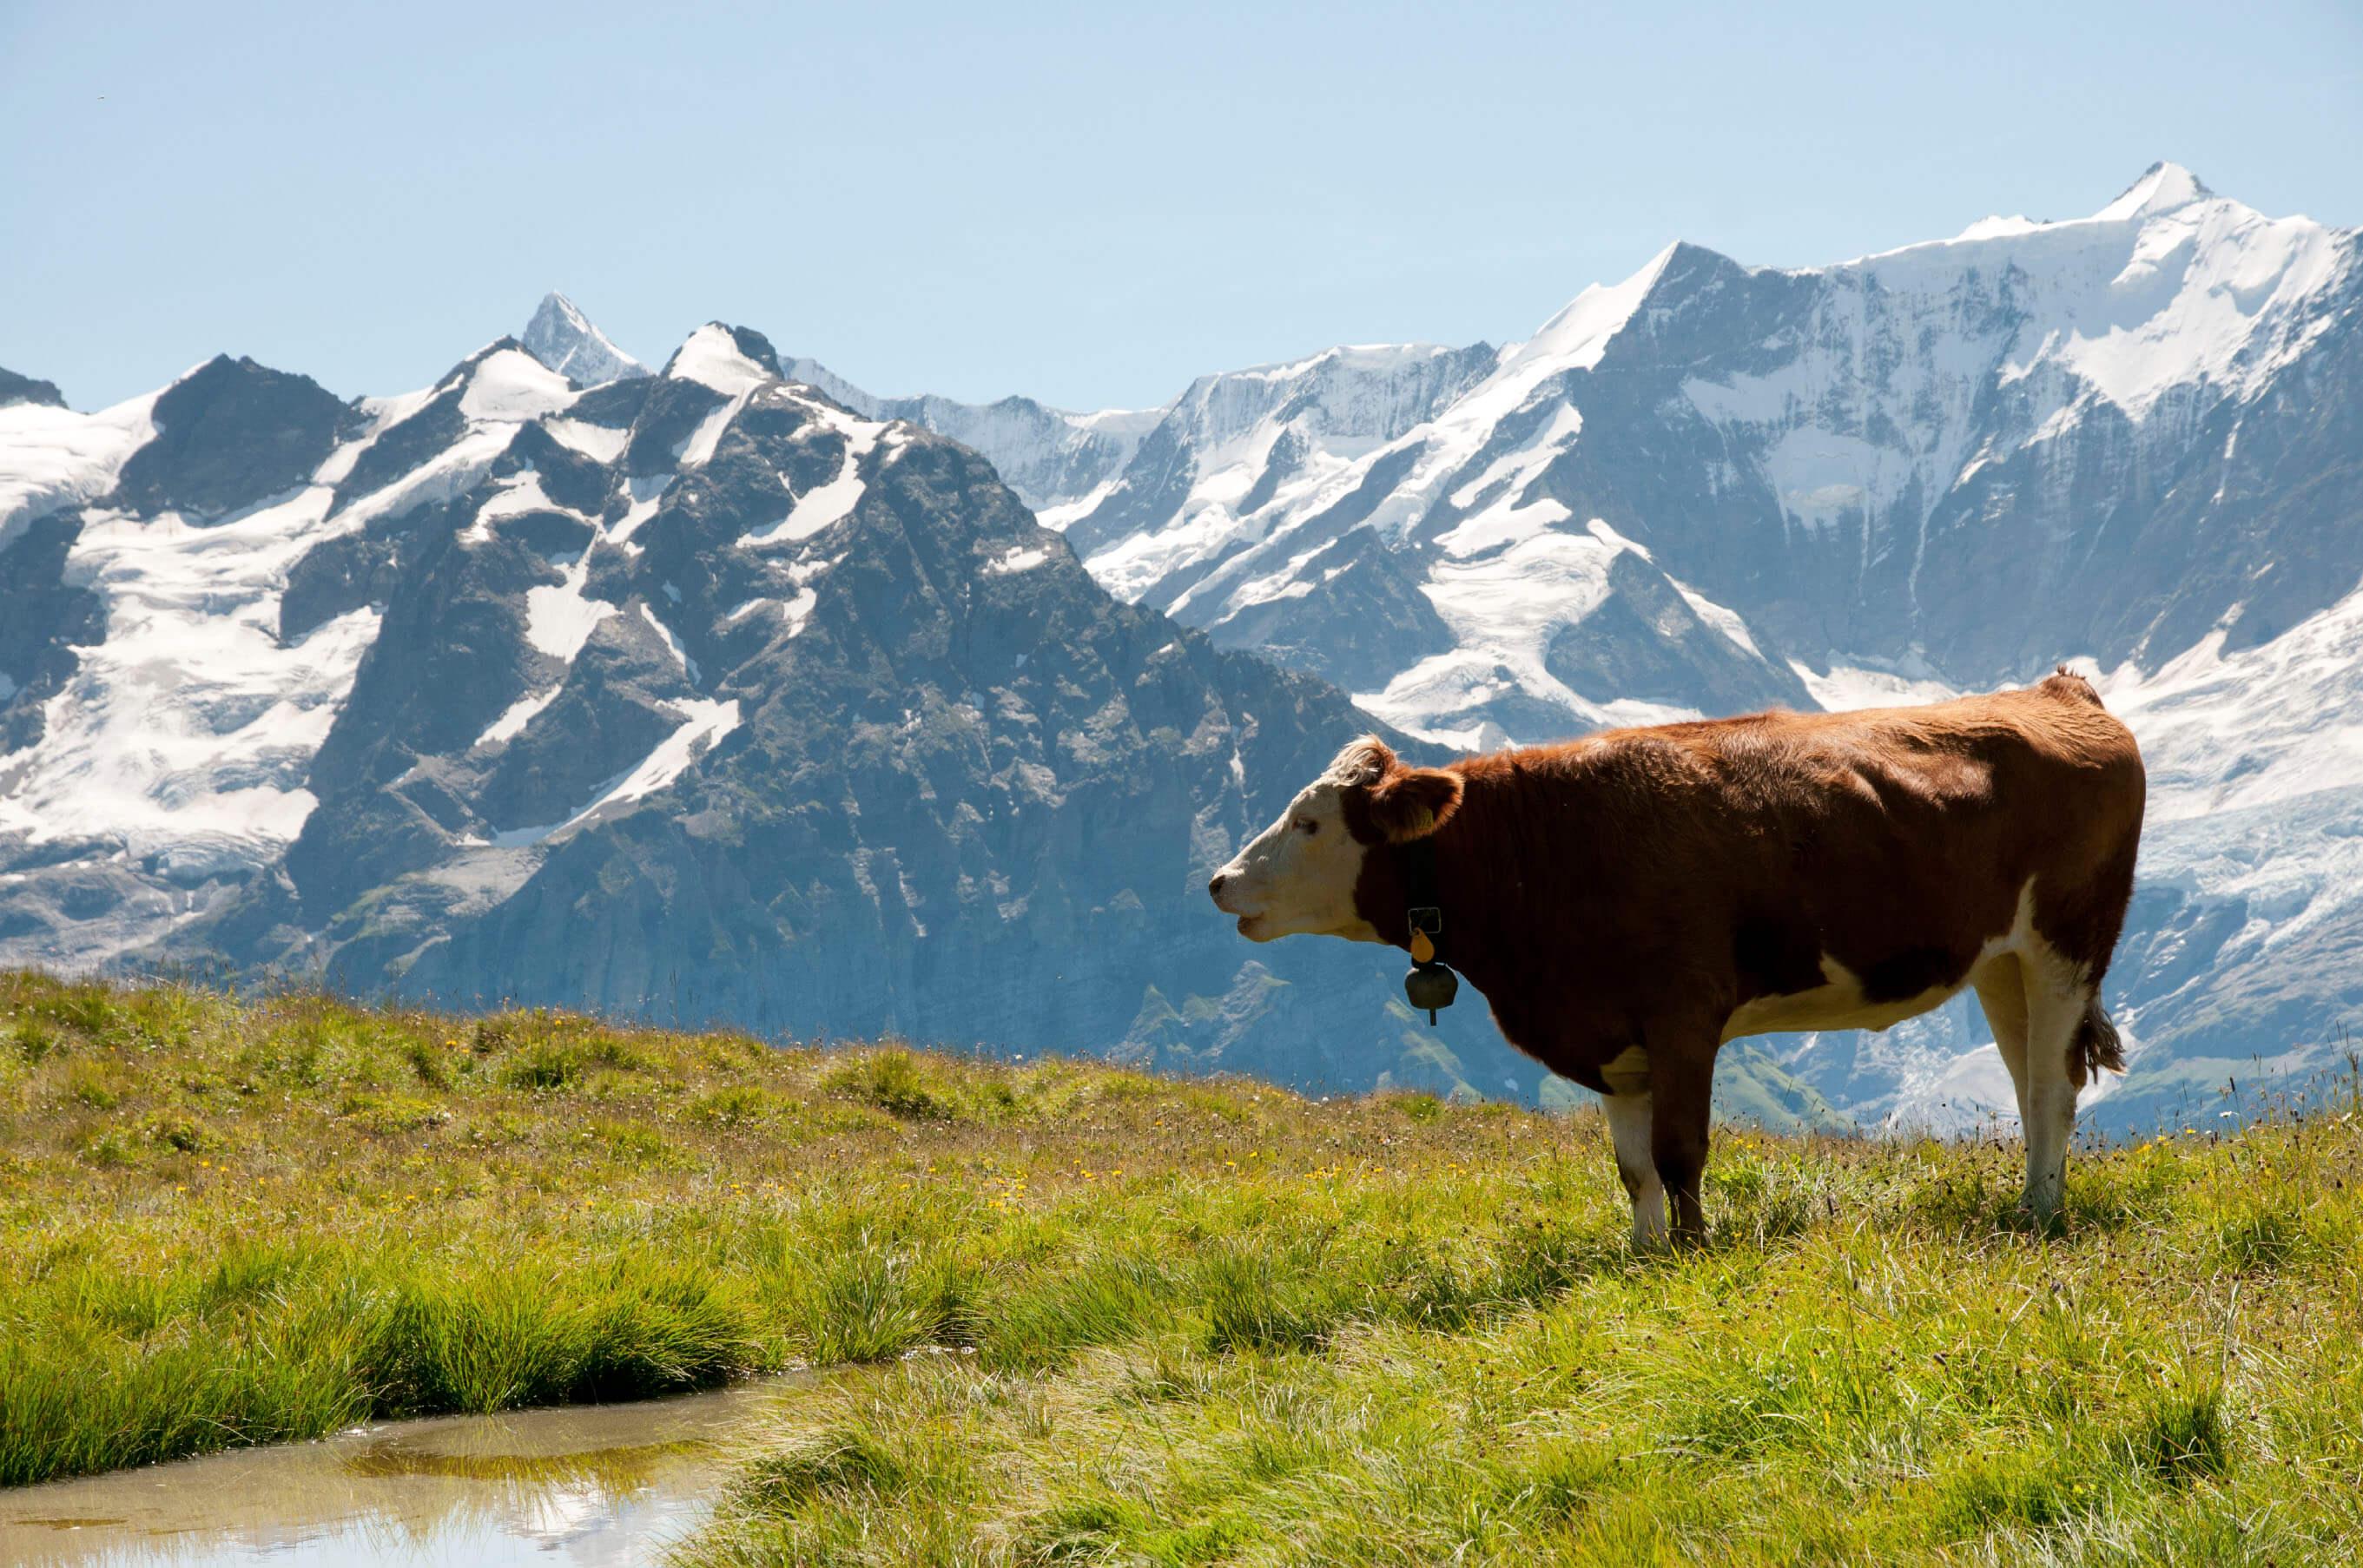 Swiss milk cow in a grass field in the Alps.